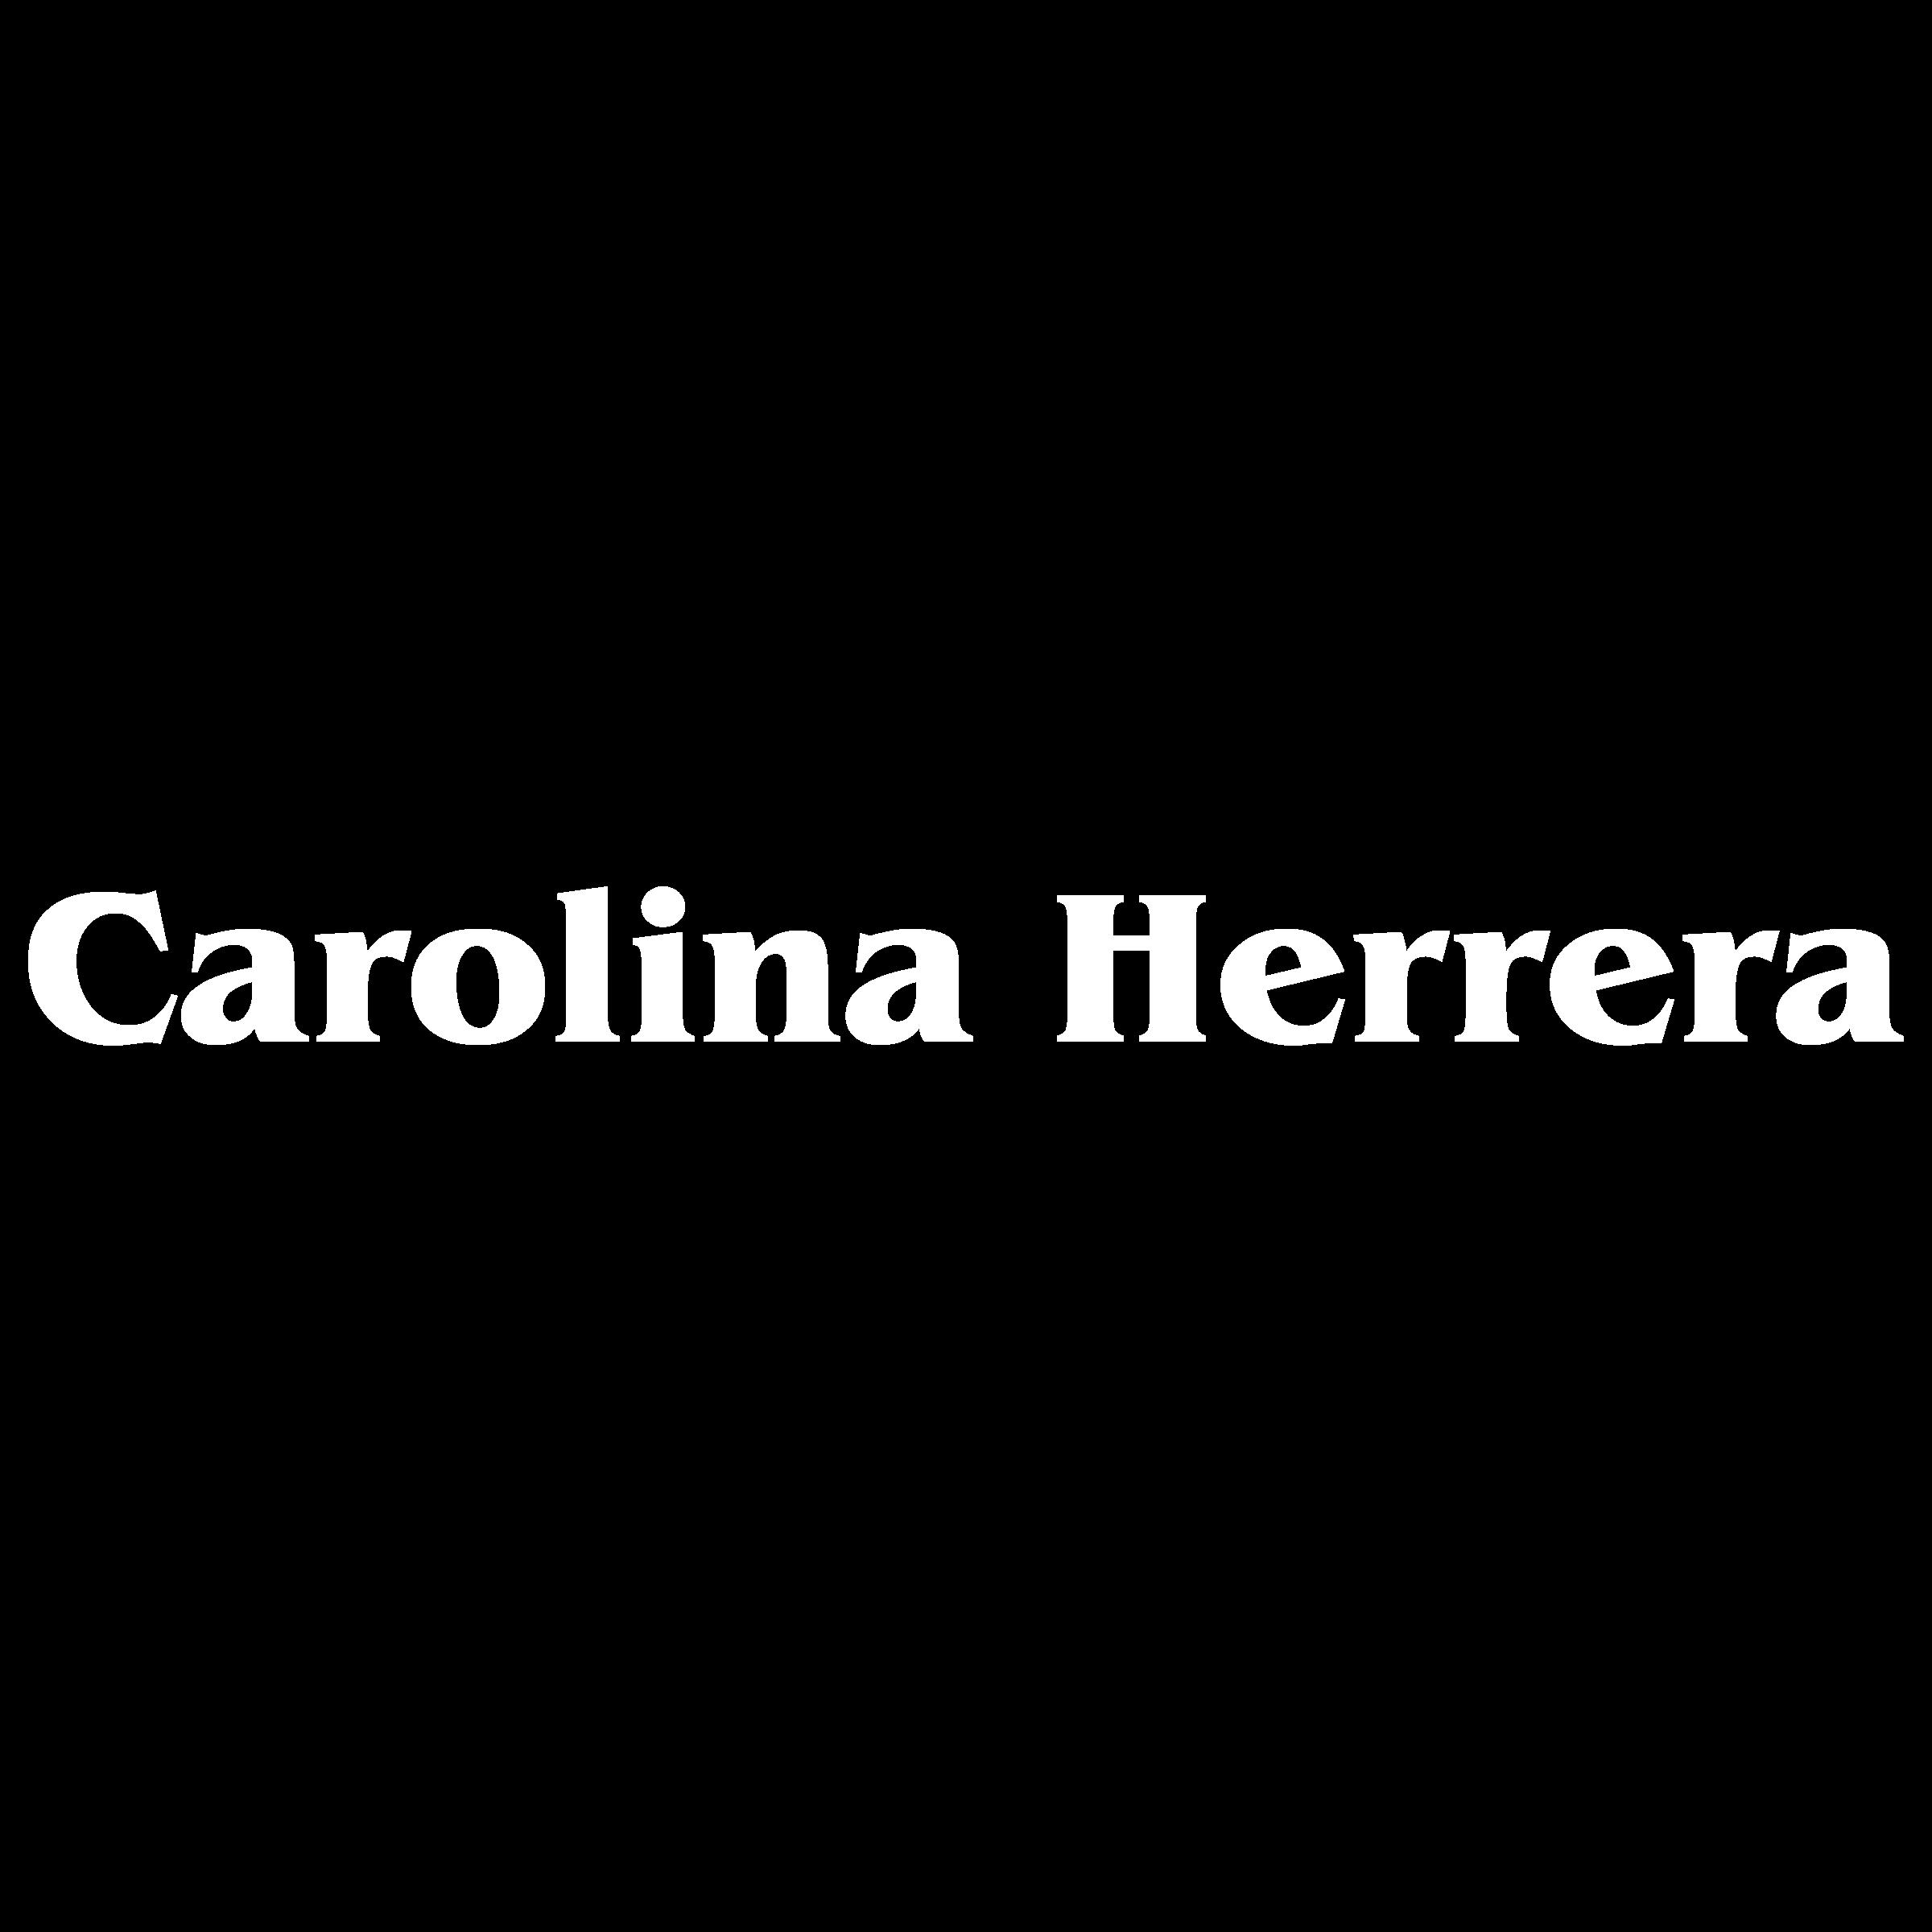 Carolina Herrera Logo PNG Transparent & SVG Vector.